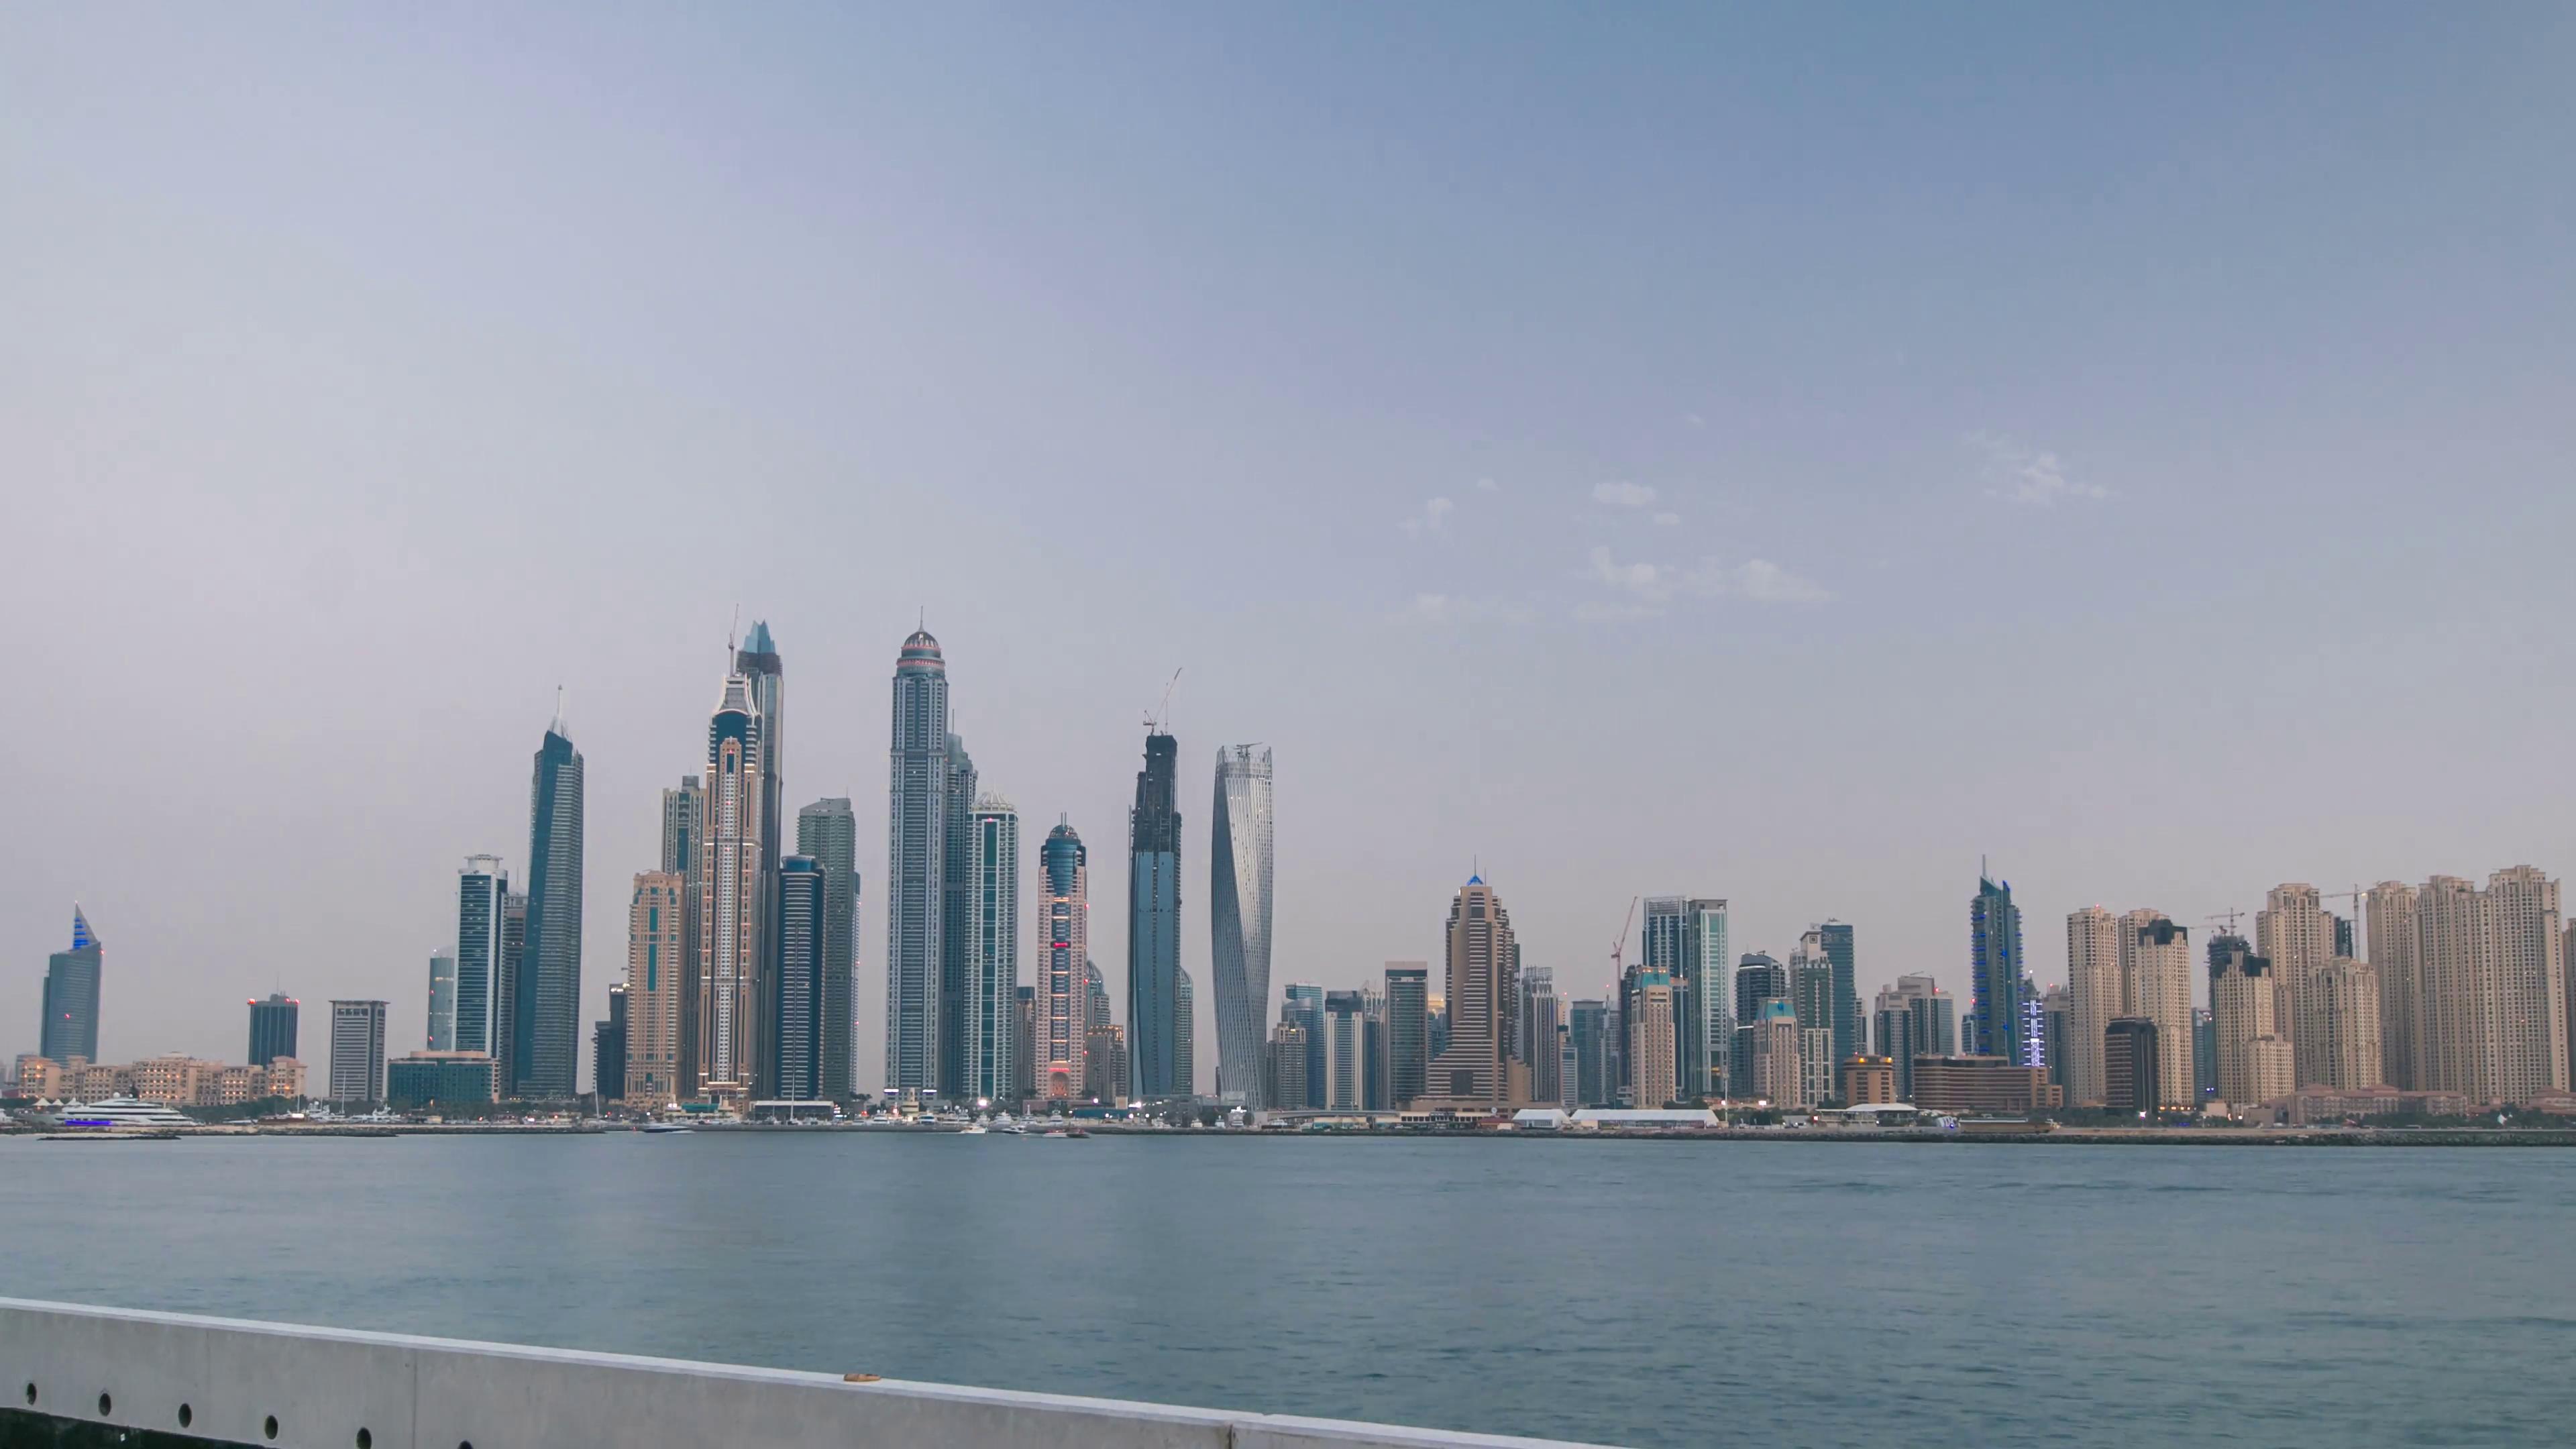 Dubai Marina skyline with JBR day to night transition timelapse as ...